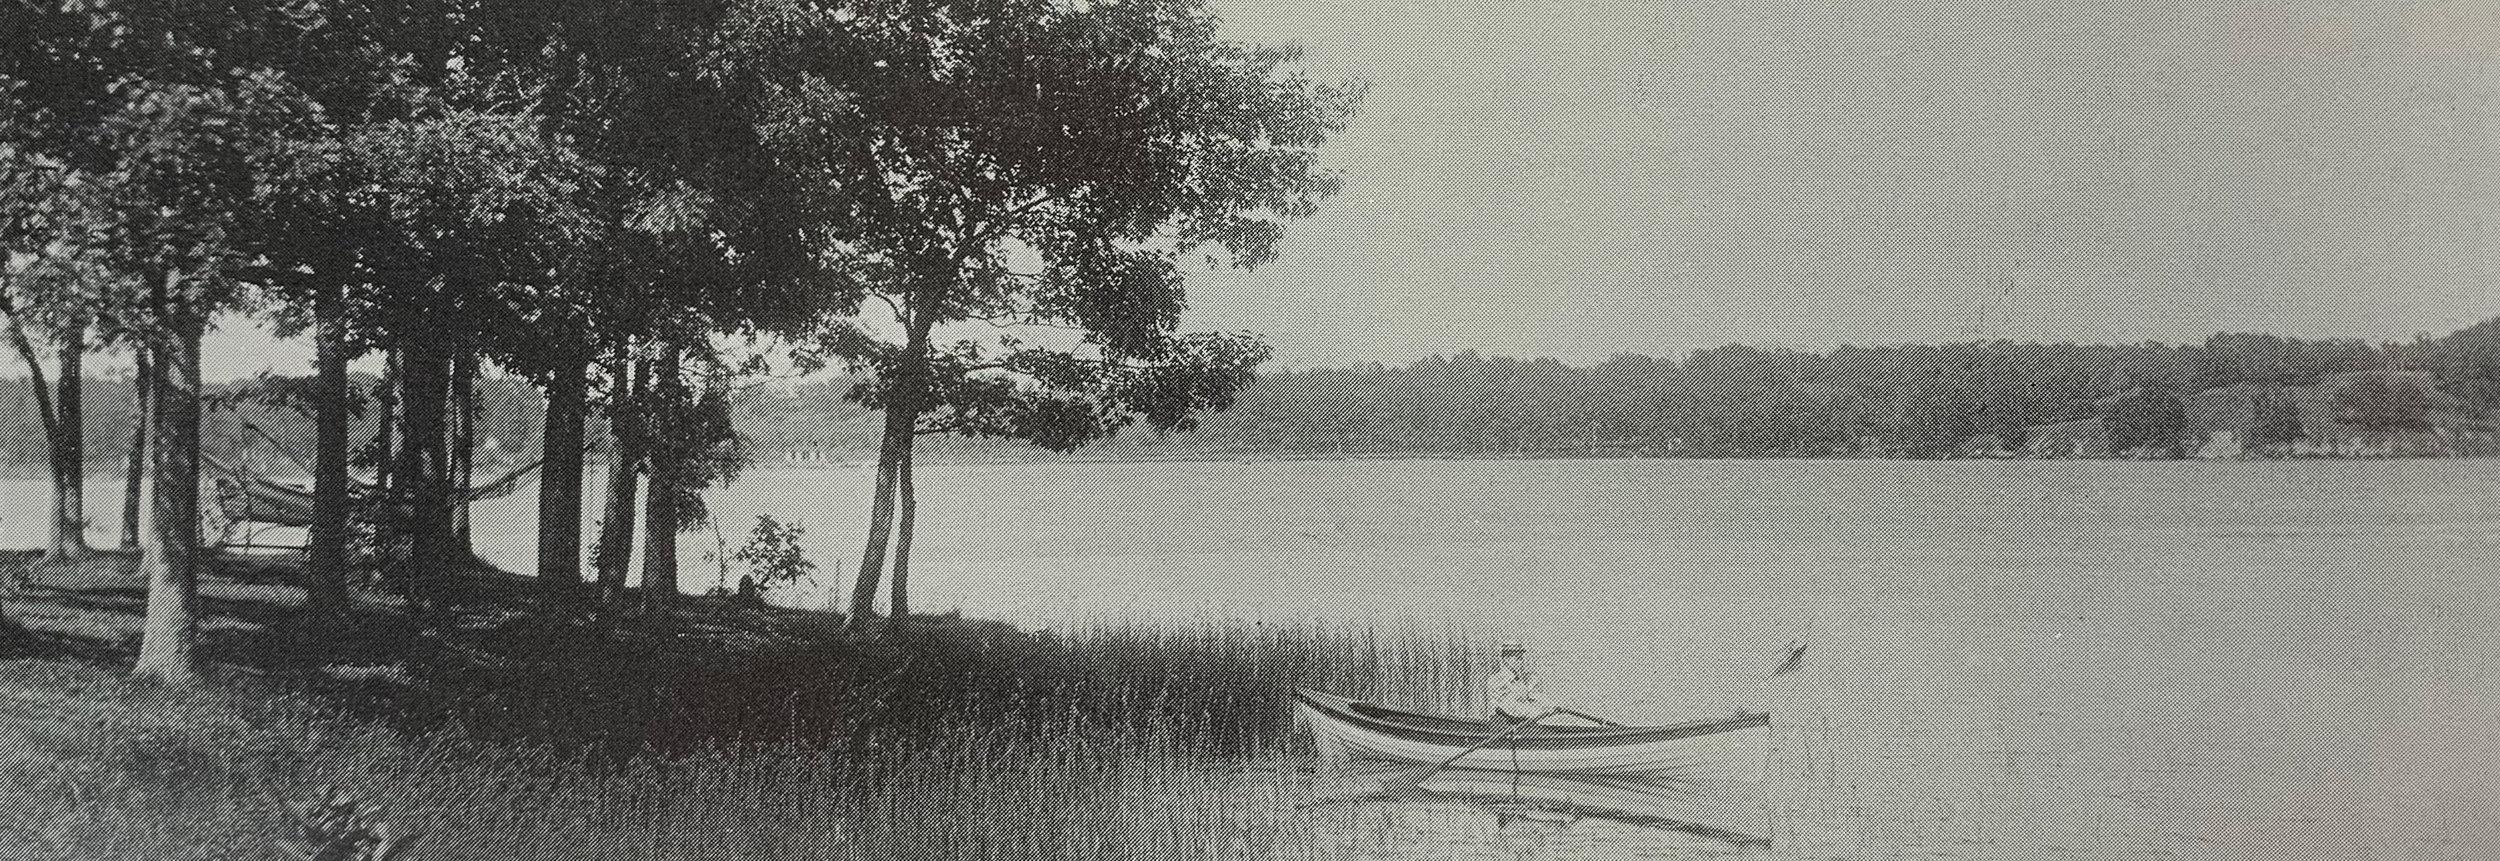 Lake_Beulah_History_LBYC-008.jpg